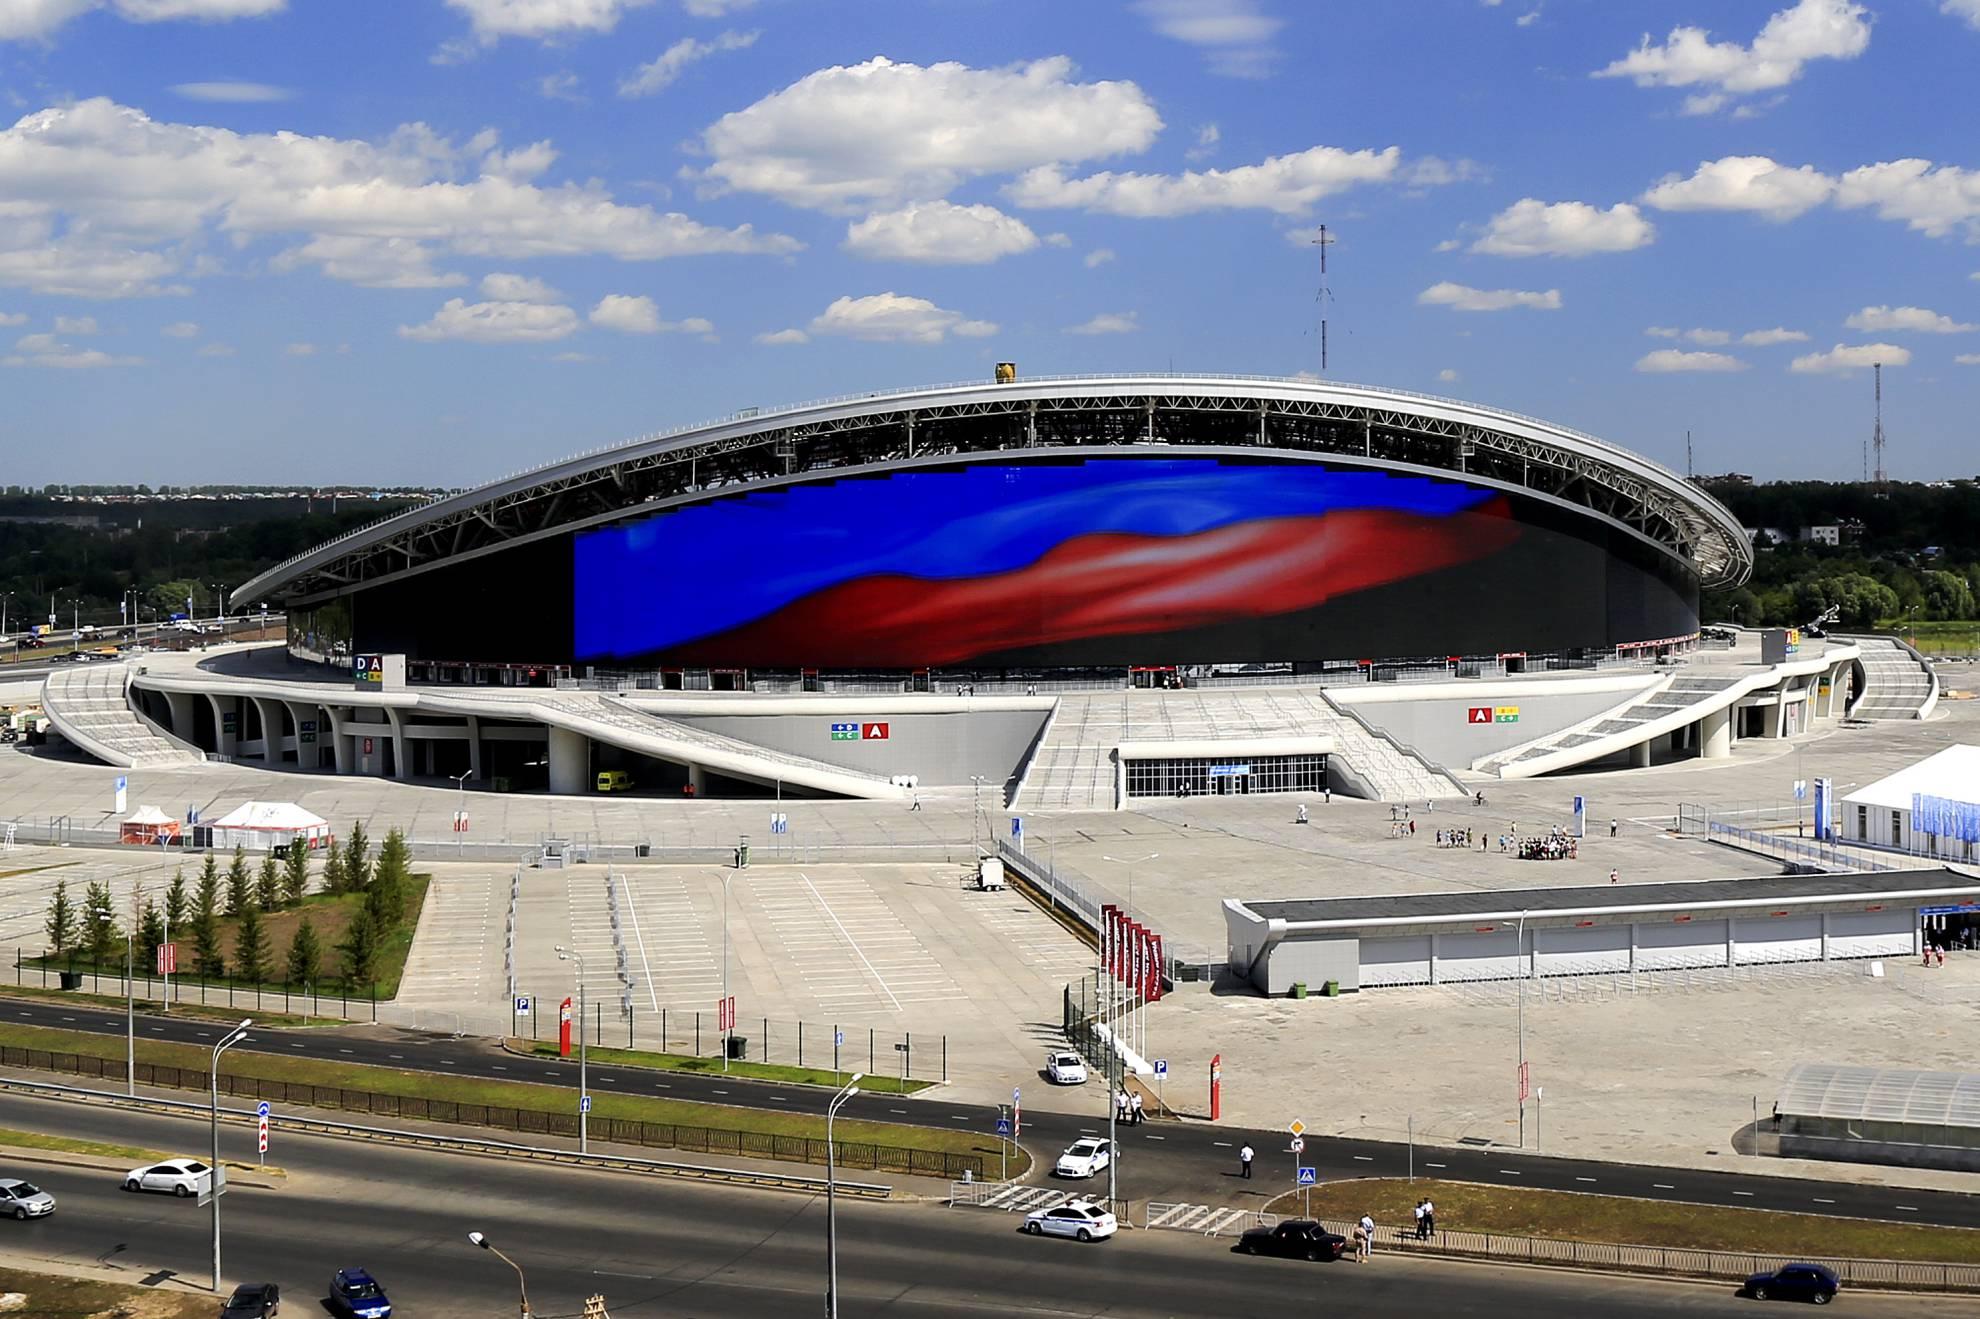 Kazán Arena